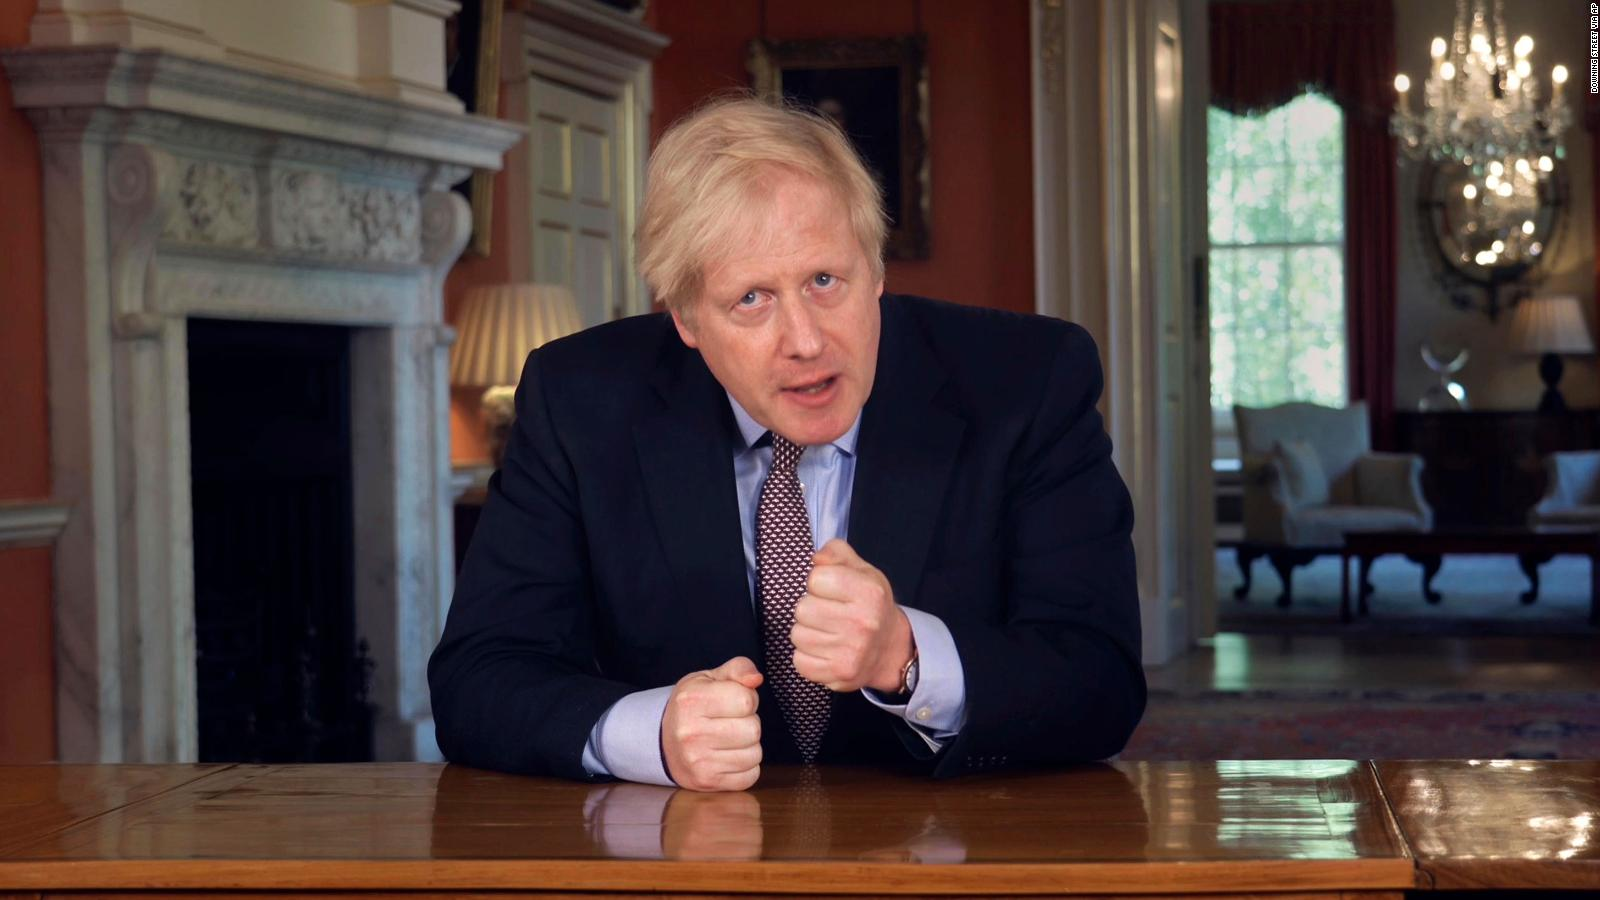 Boris Johnson accused of botching announcement of new UK lockdown rules -  CNN